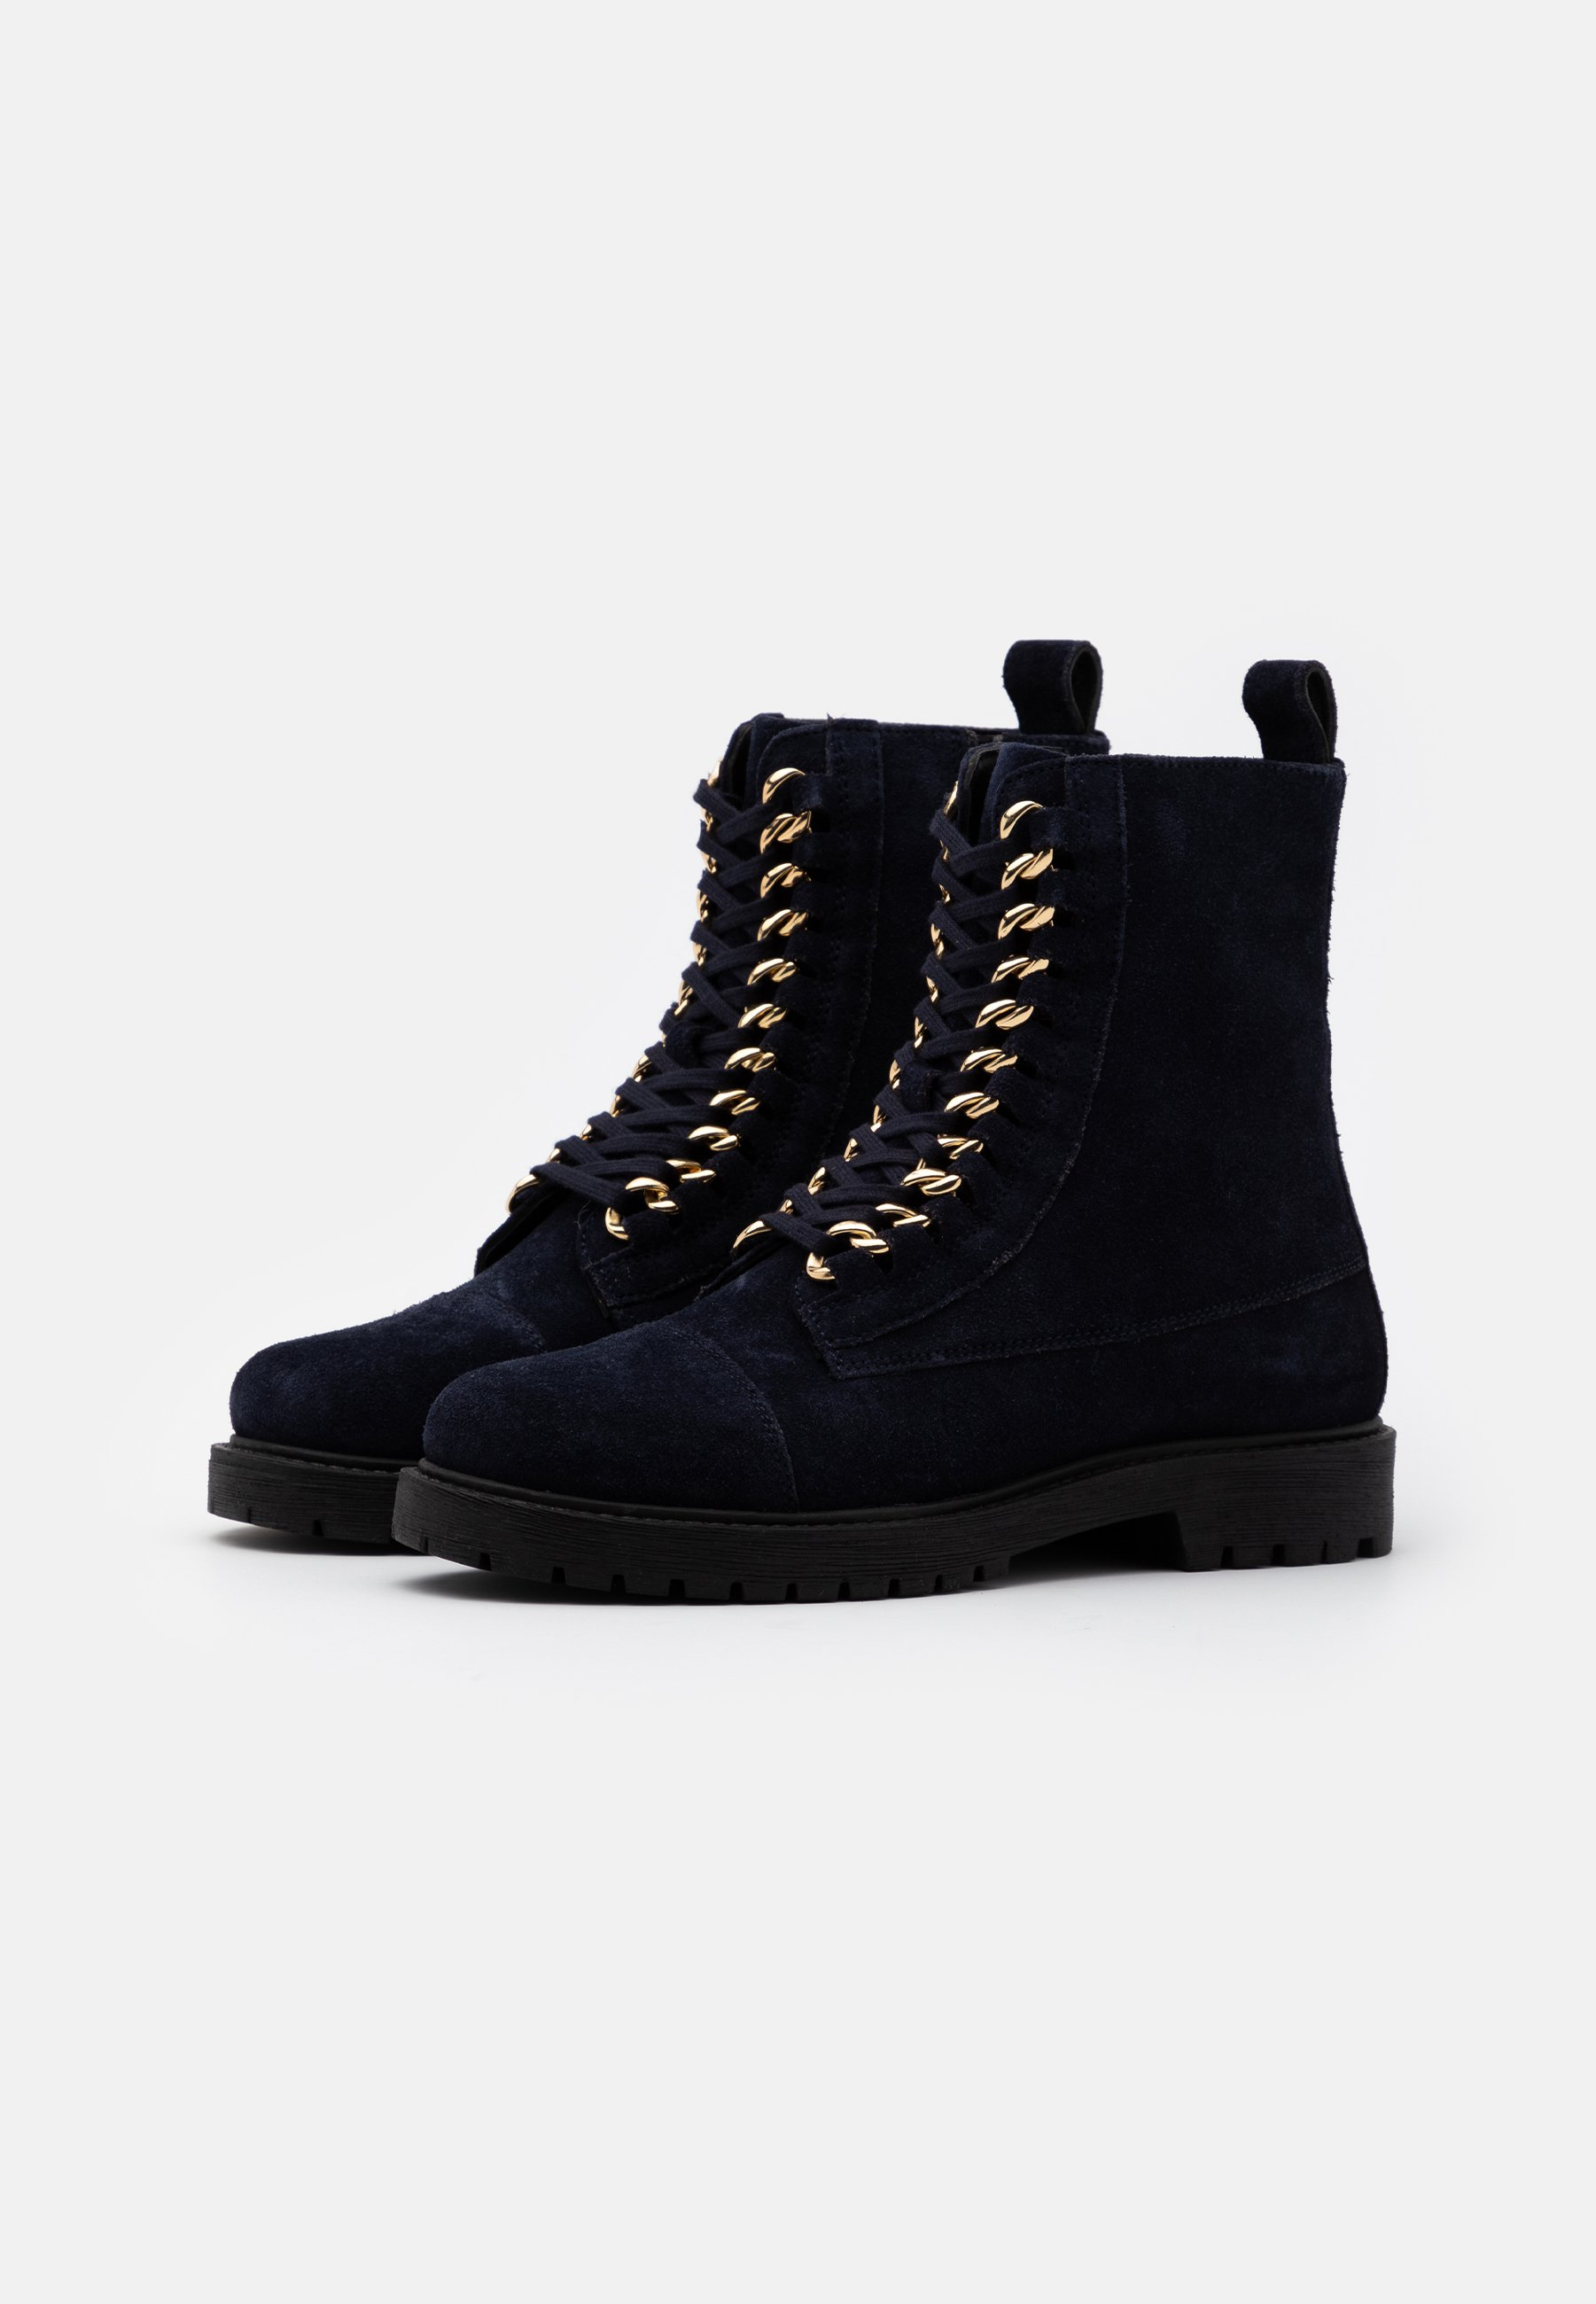 Scarpe da donna Copenhagen Shoes ALLY  Stivaletti stringati navy